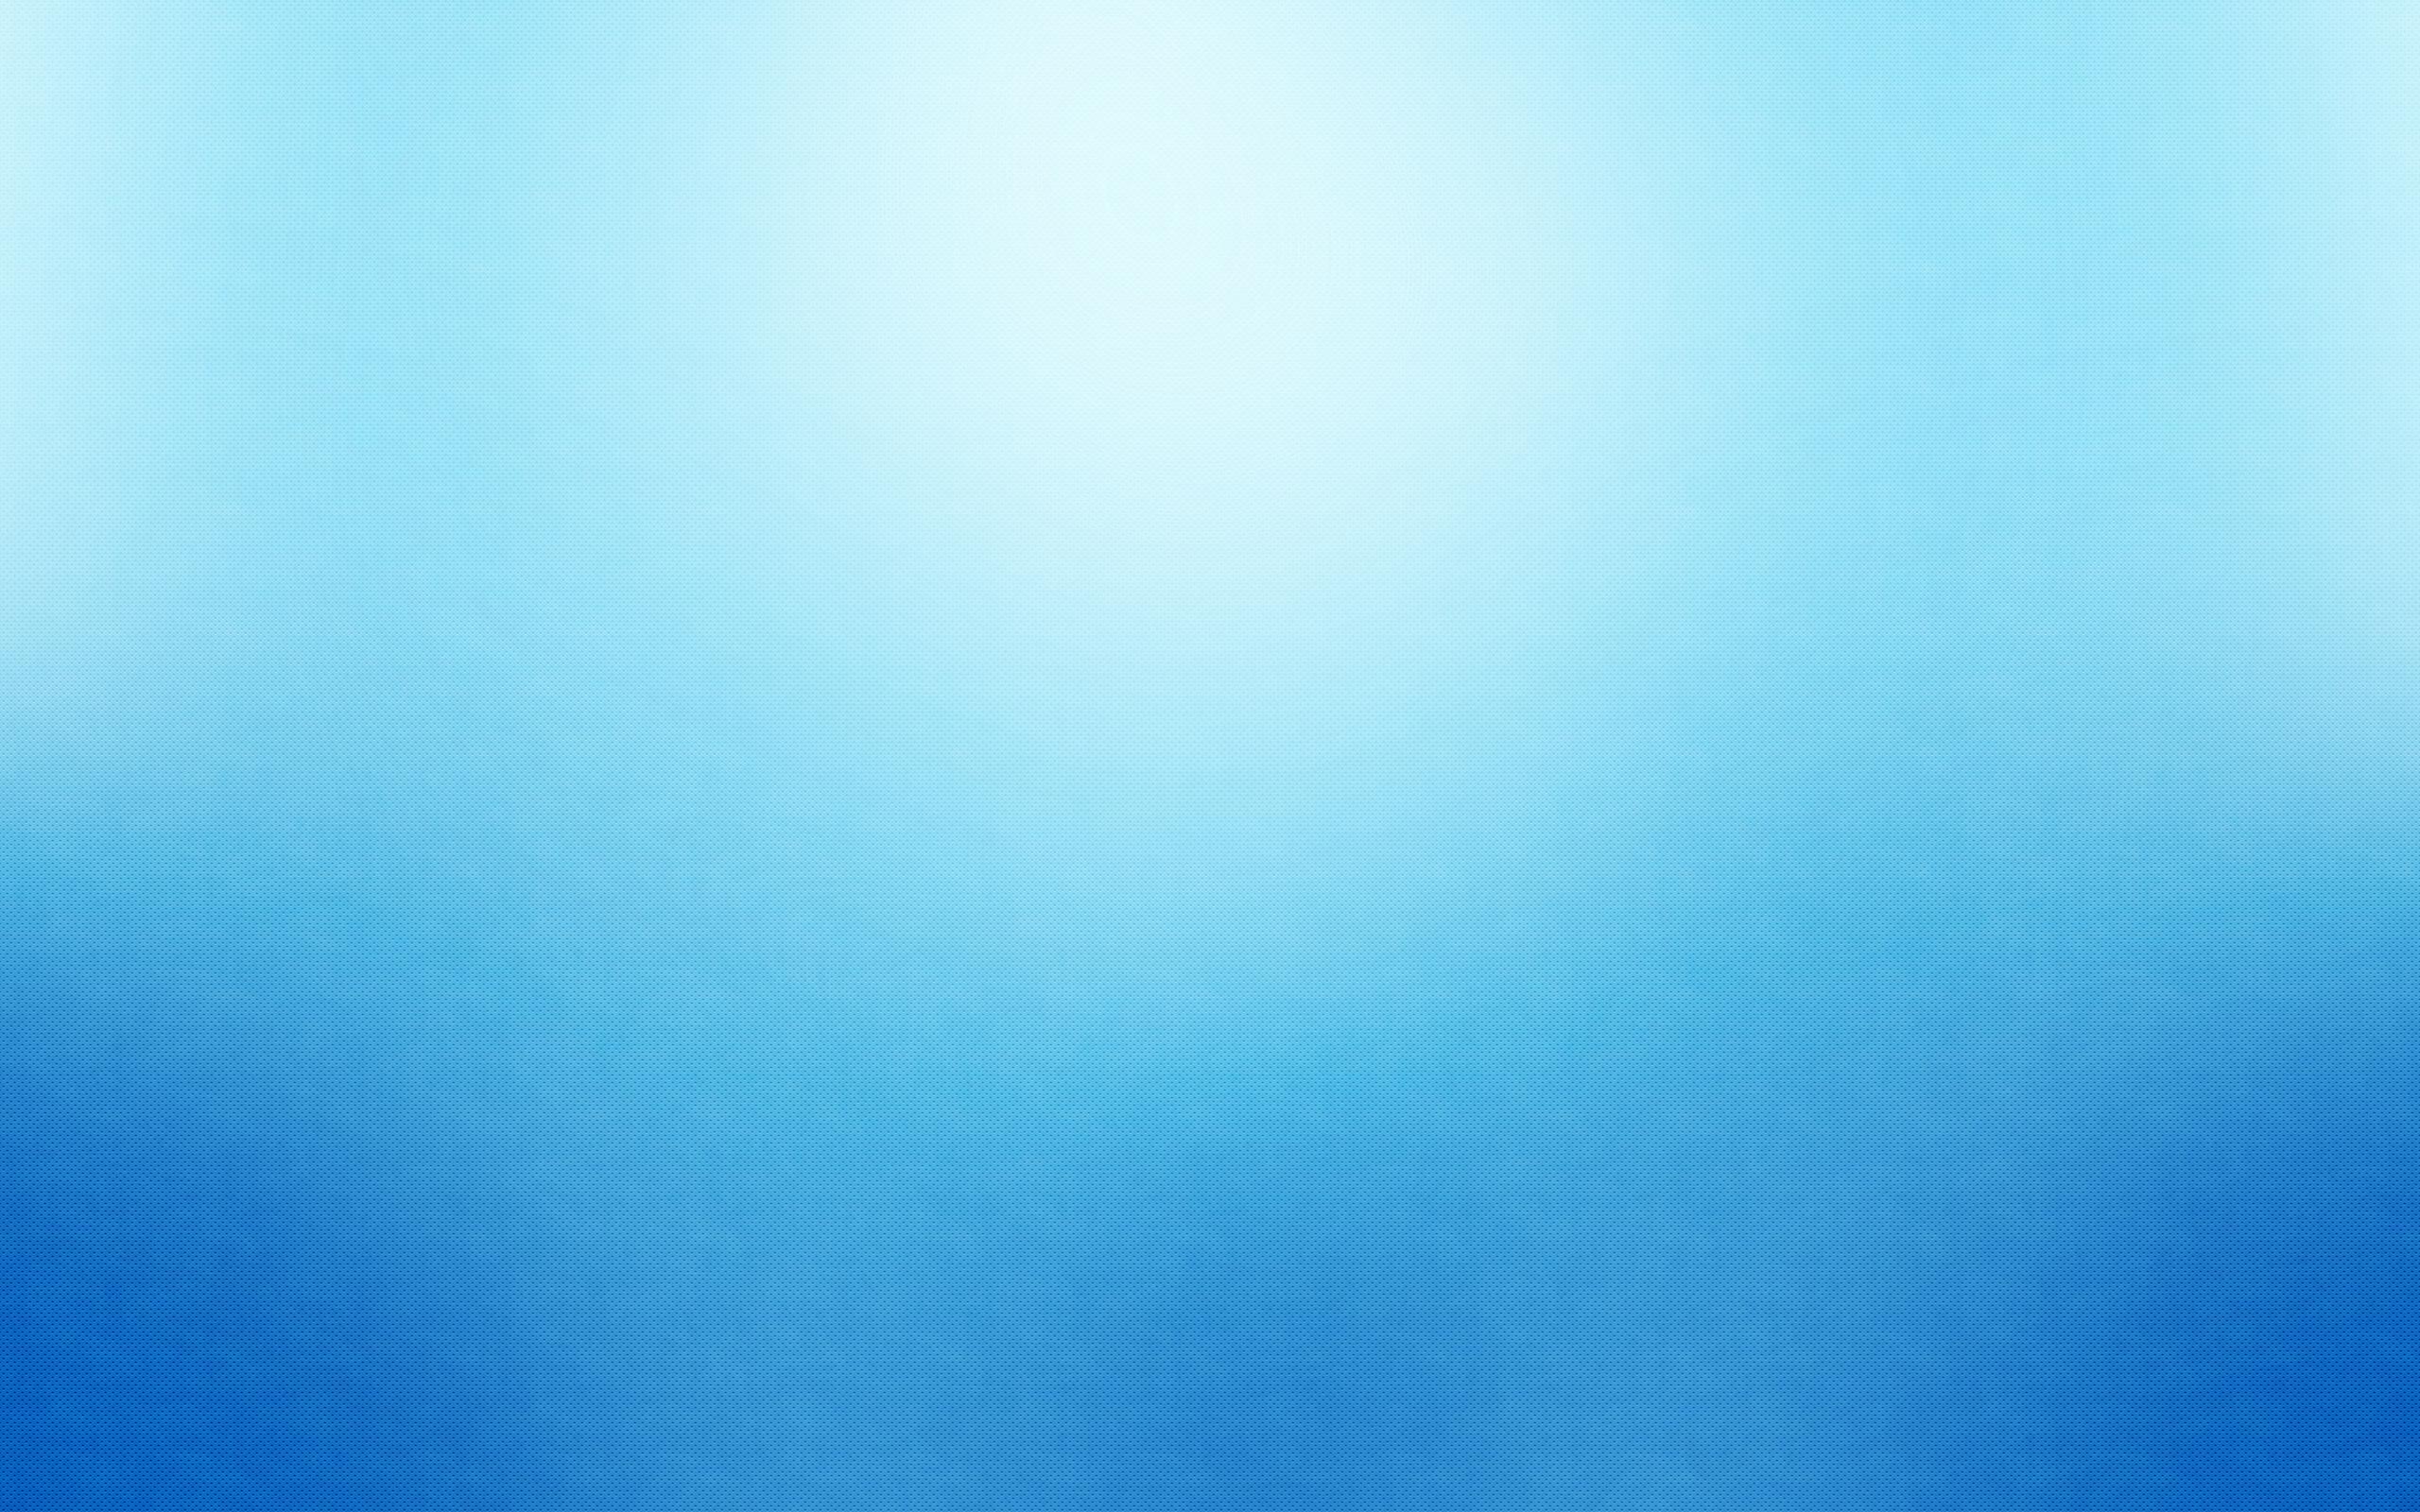 Blue Color Background Wallpaper - WallpaperSafari